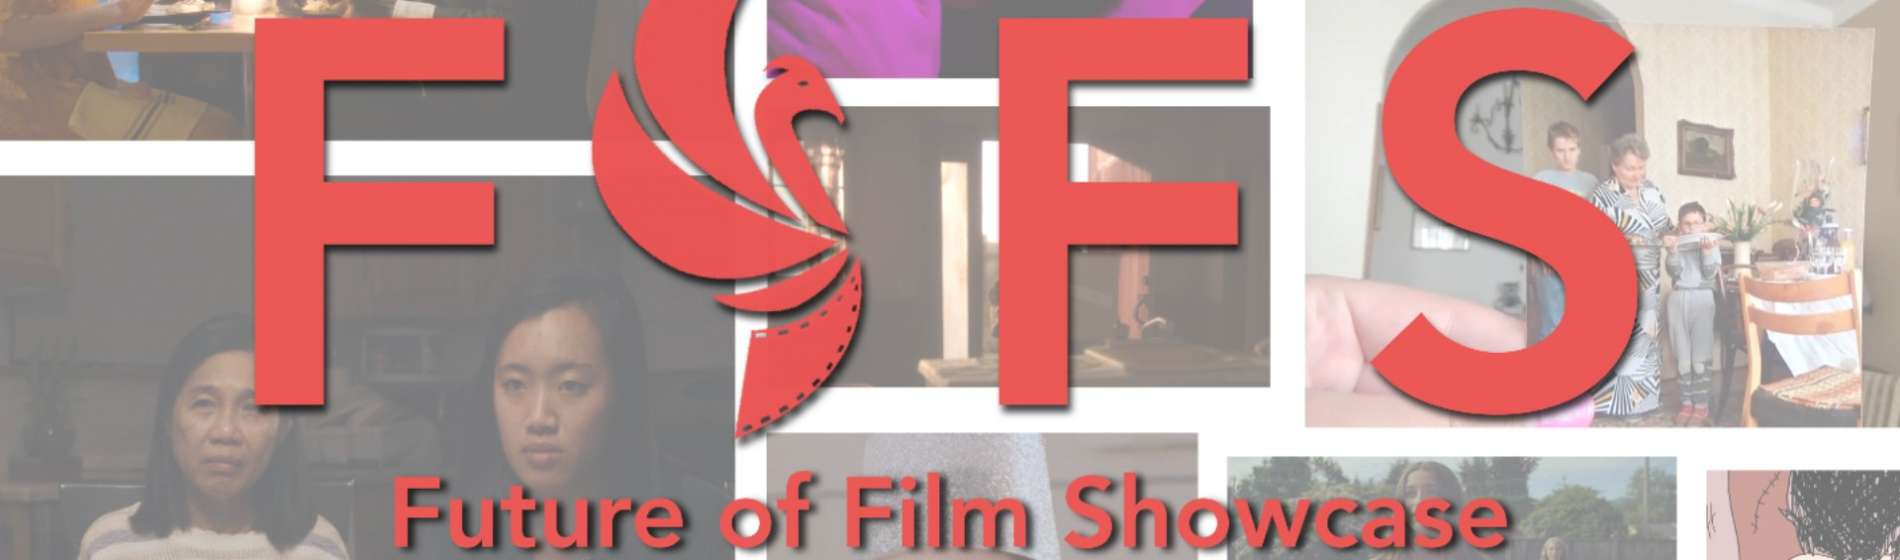 Future of Film Showcase Feature Image